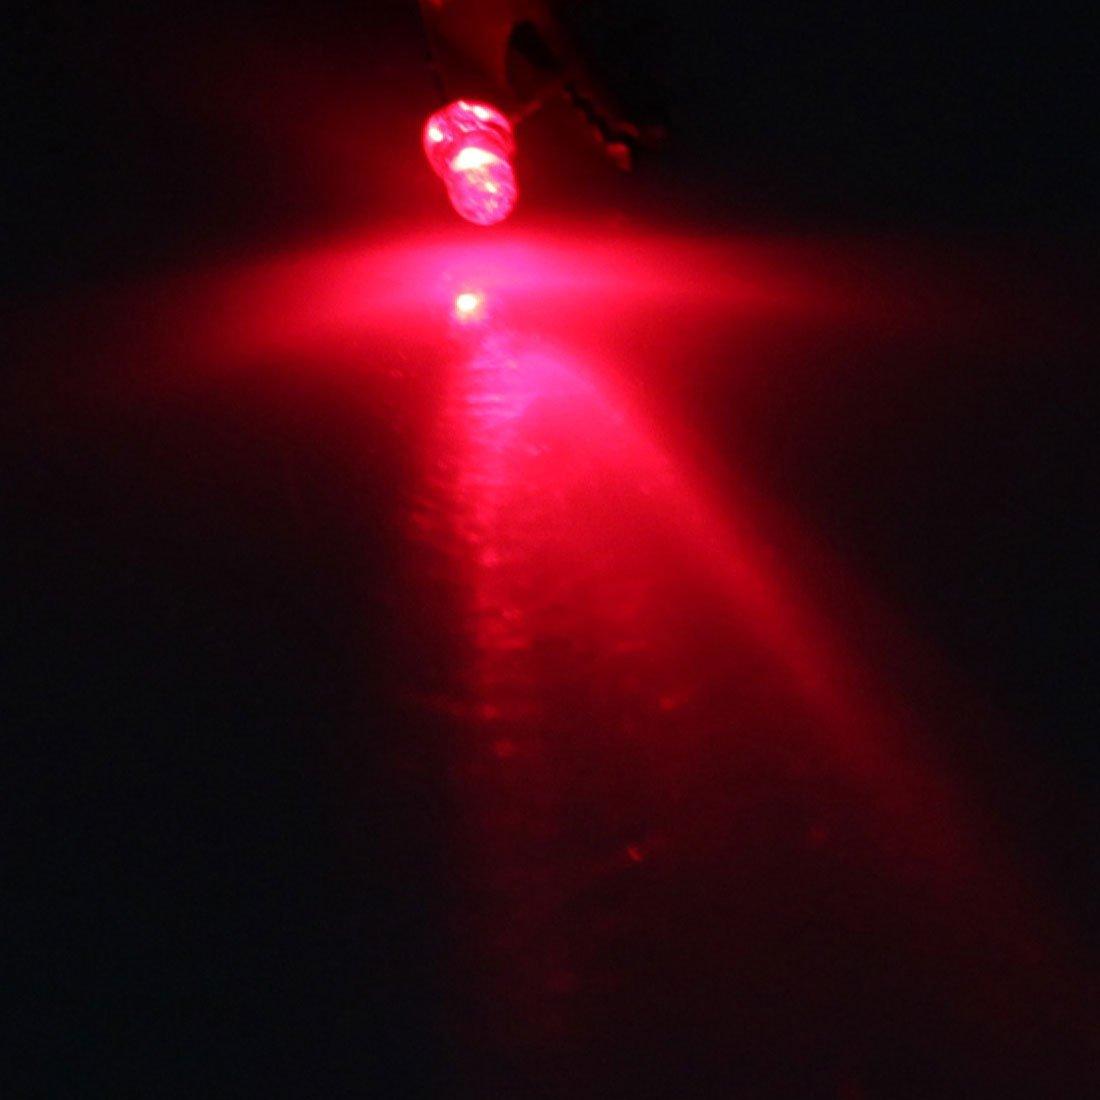 3mm Top 2 Terminales Largas eDealMax 100pcs Red Light Emitting Diode LED bombilla de la lámpara: Amazon.com: Industrial & Scientific